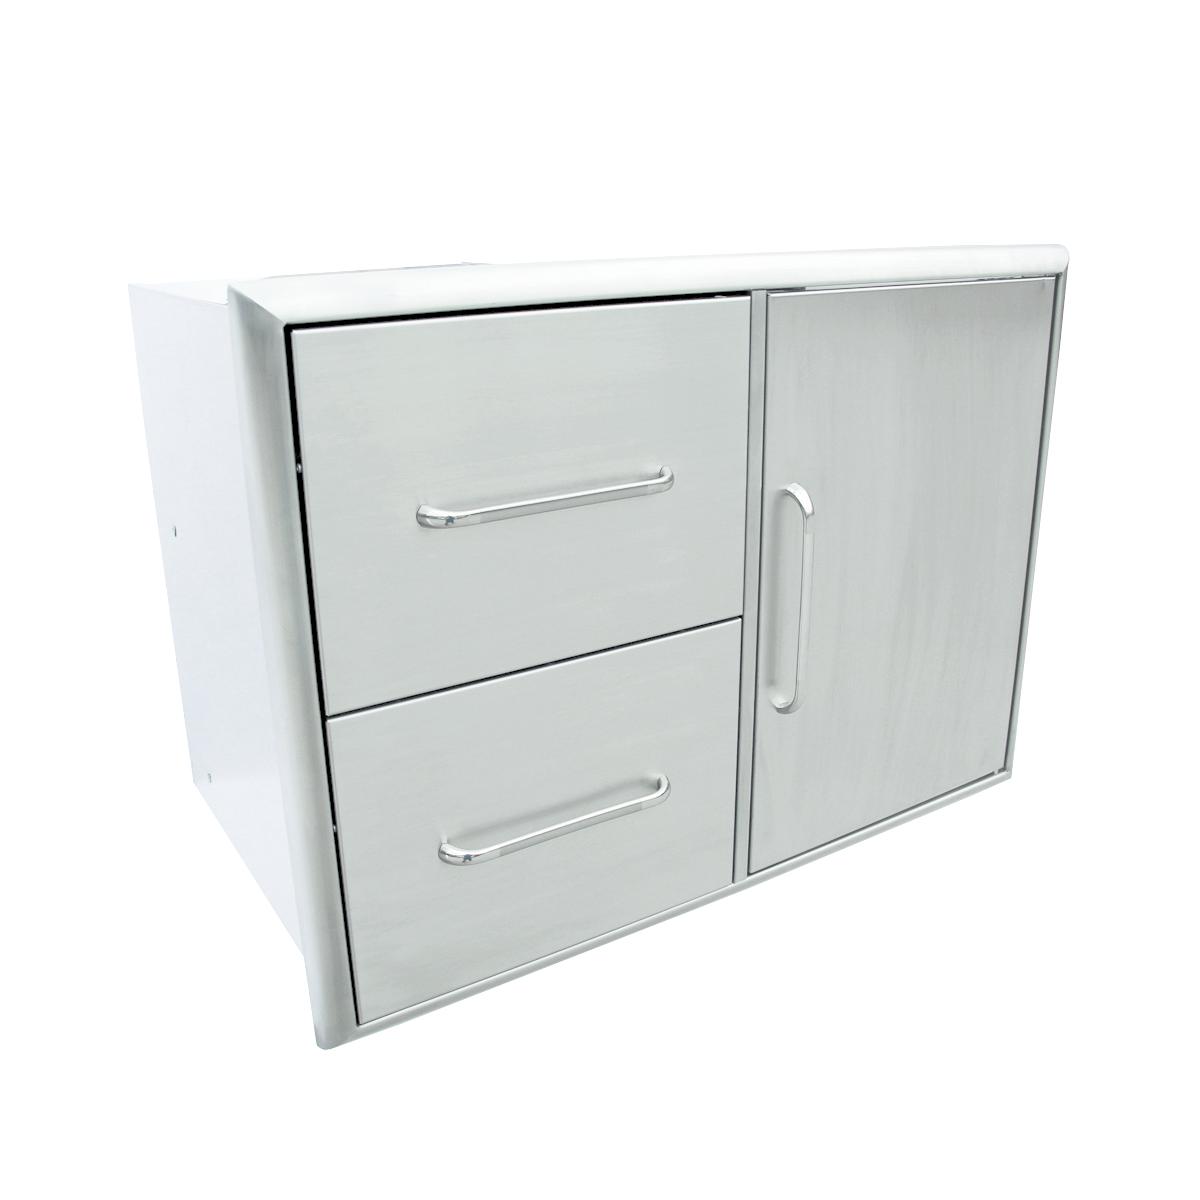 new_LW_double_drawer_and_door_combo_1818__61915.1435748864.1280.1280